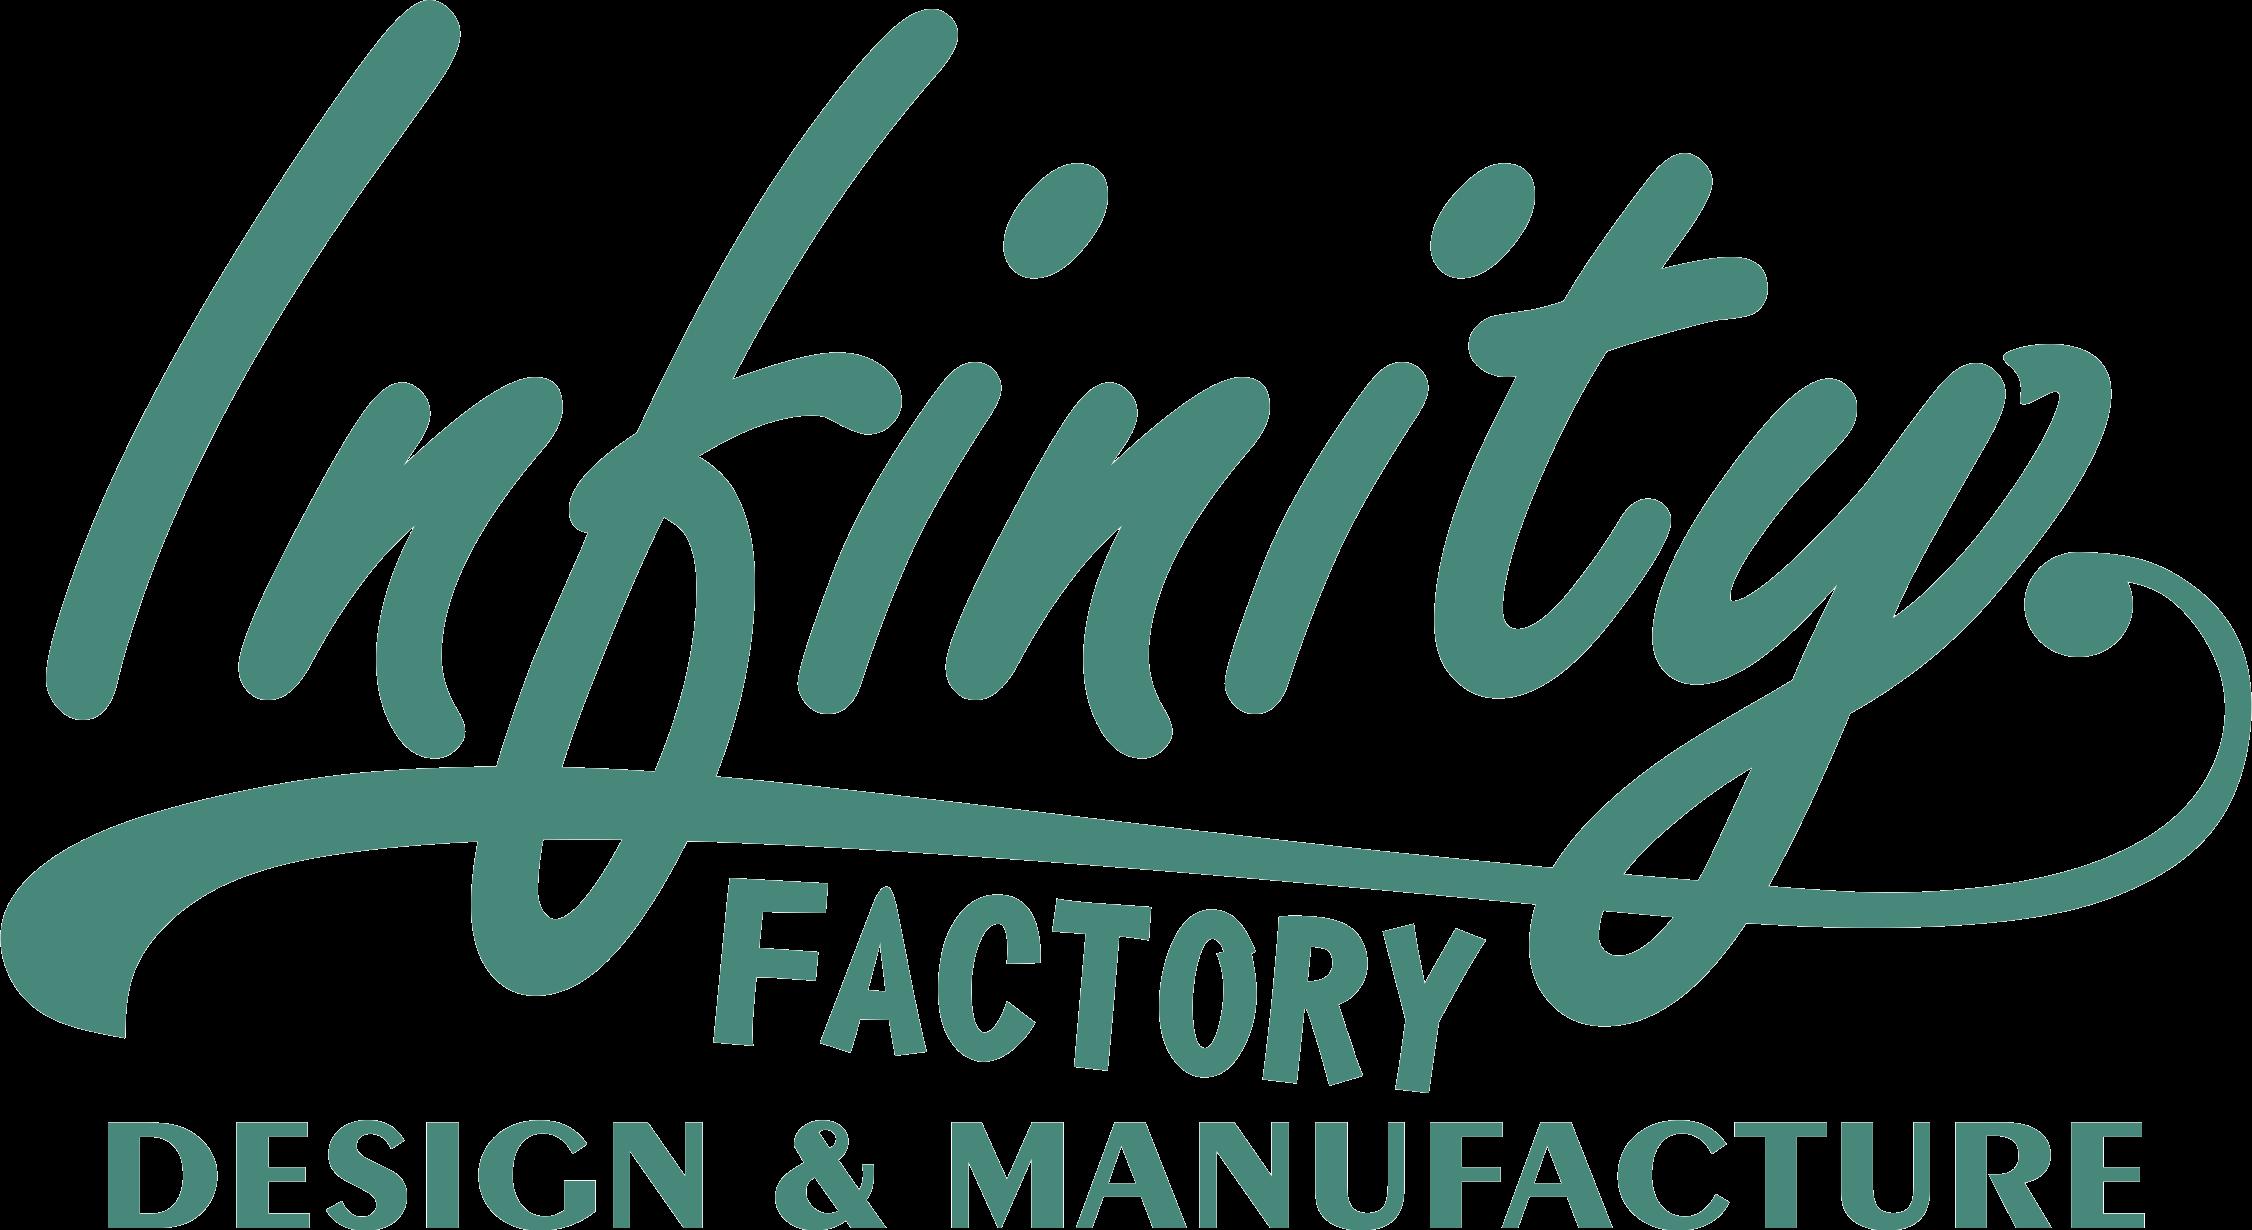 Infinity Factory